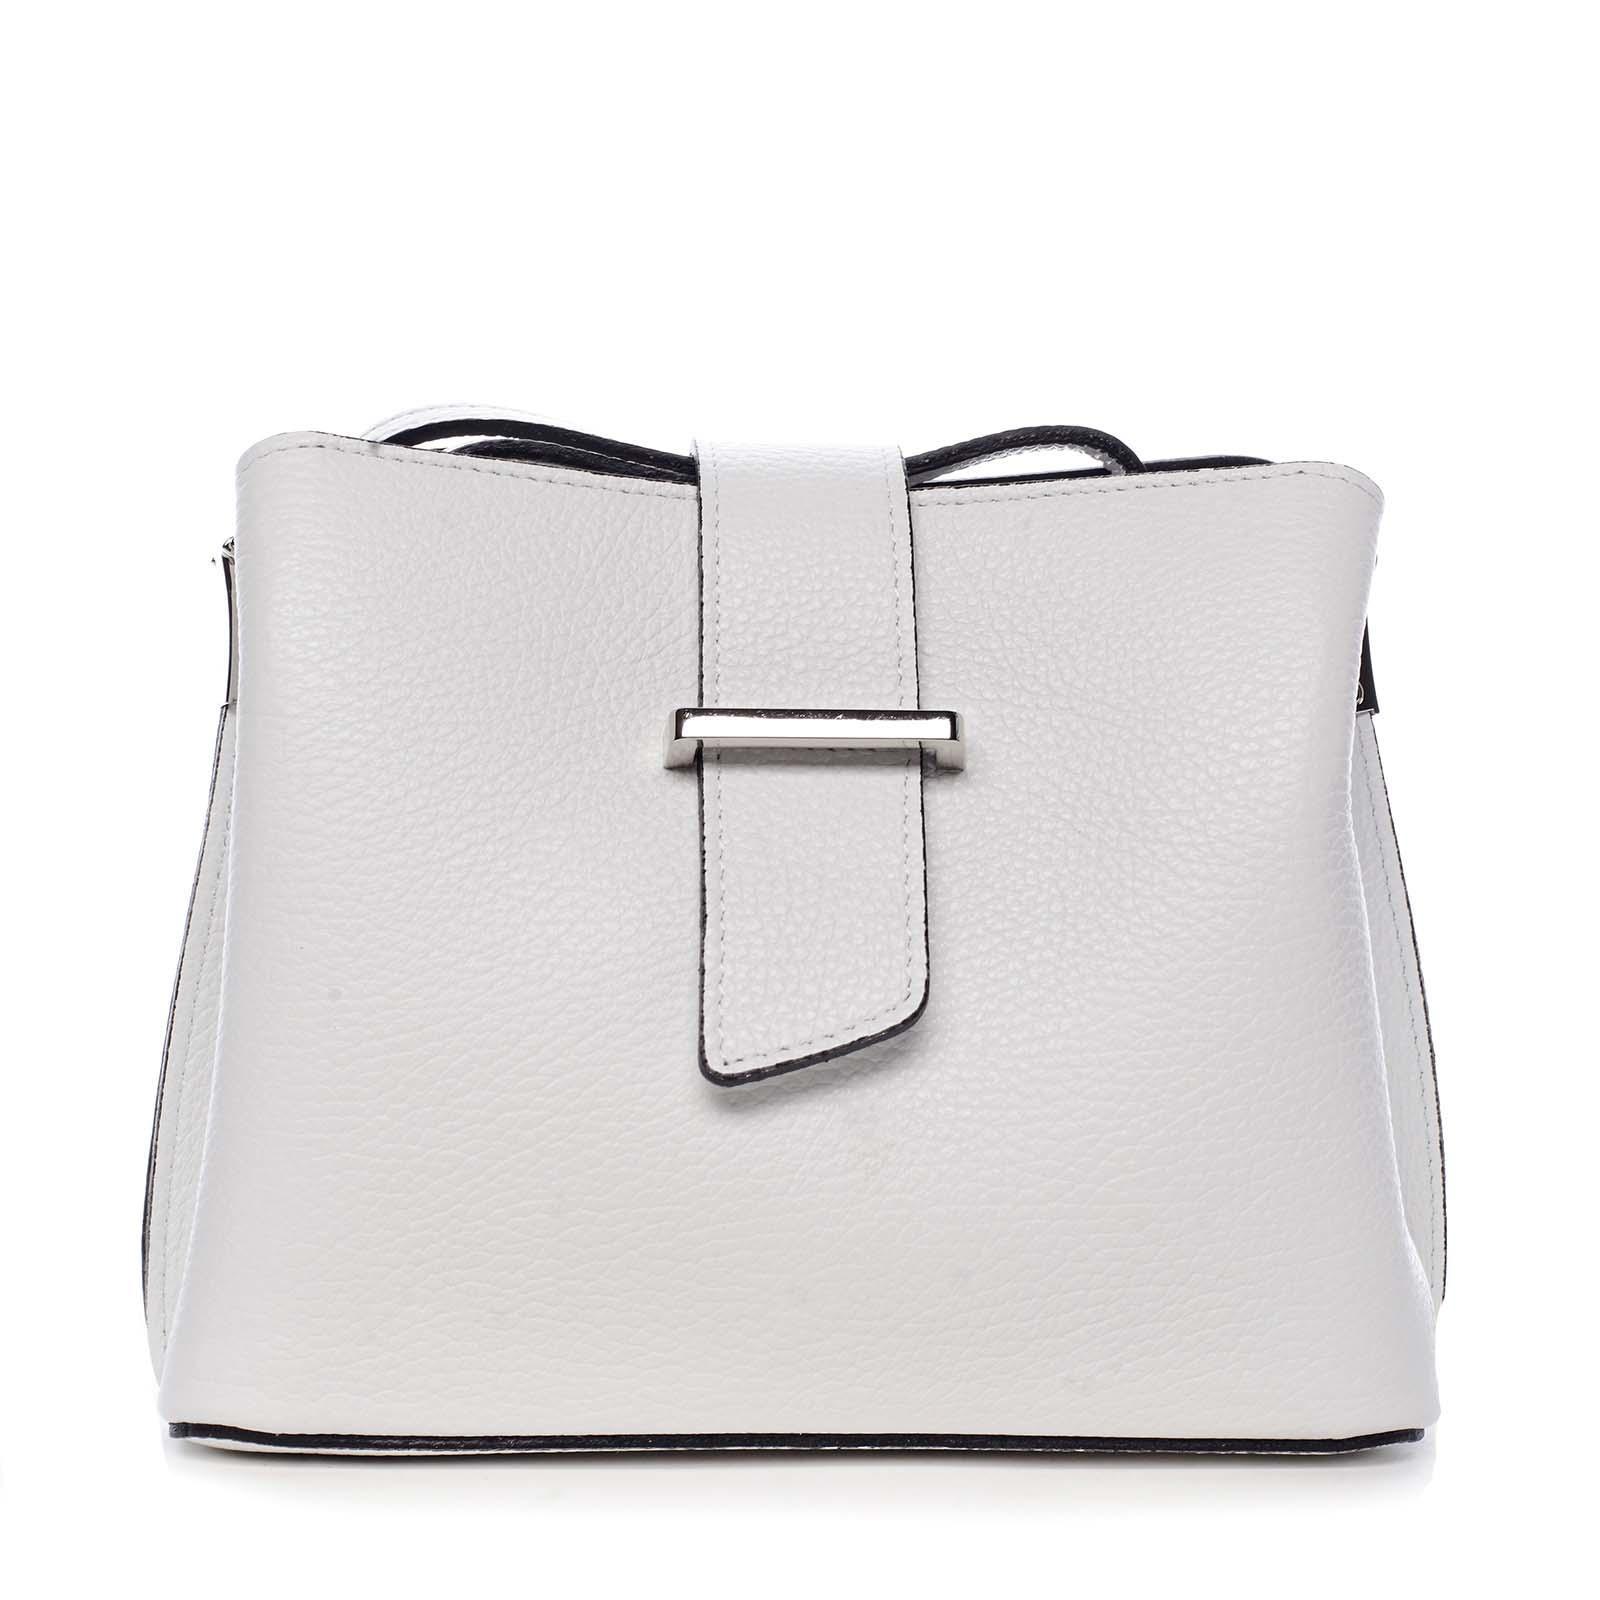 Dámská kožená crossbody kabelka bílá - ItalY Euren